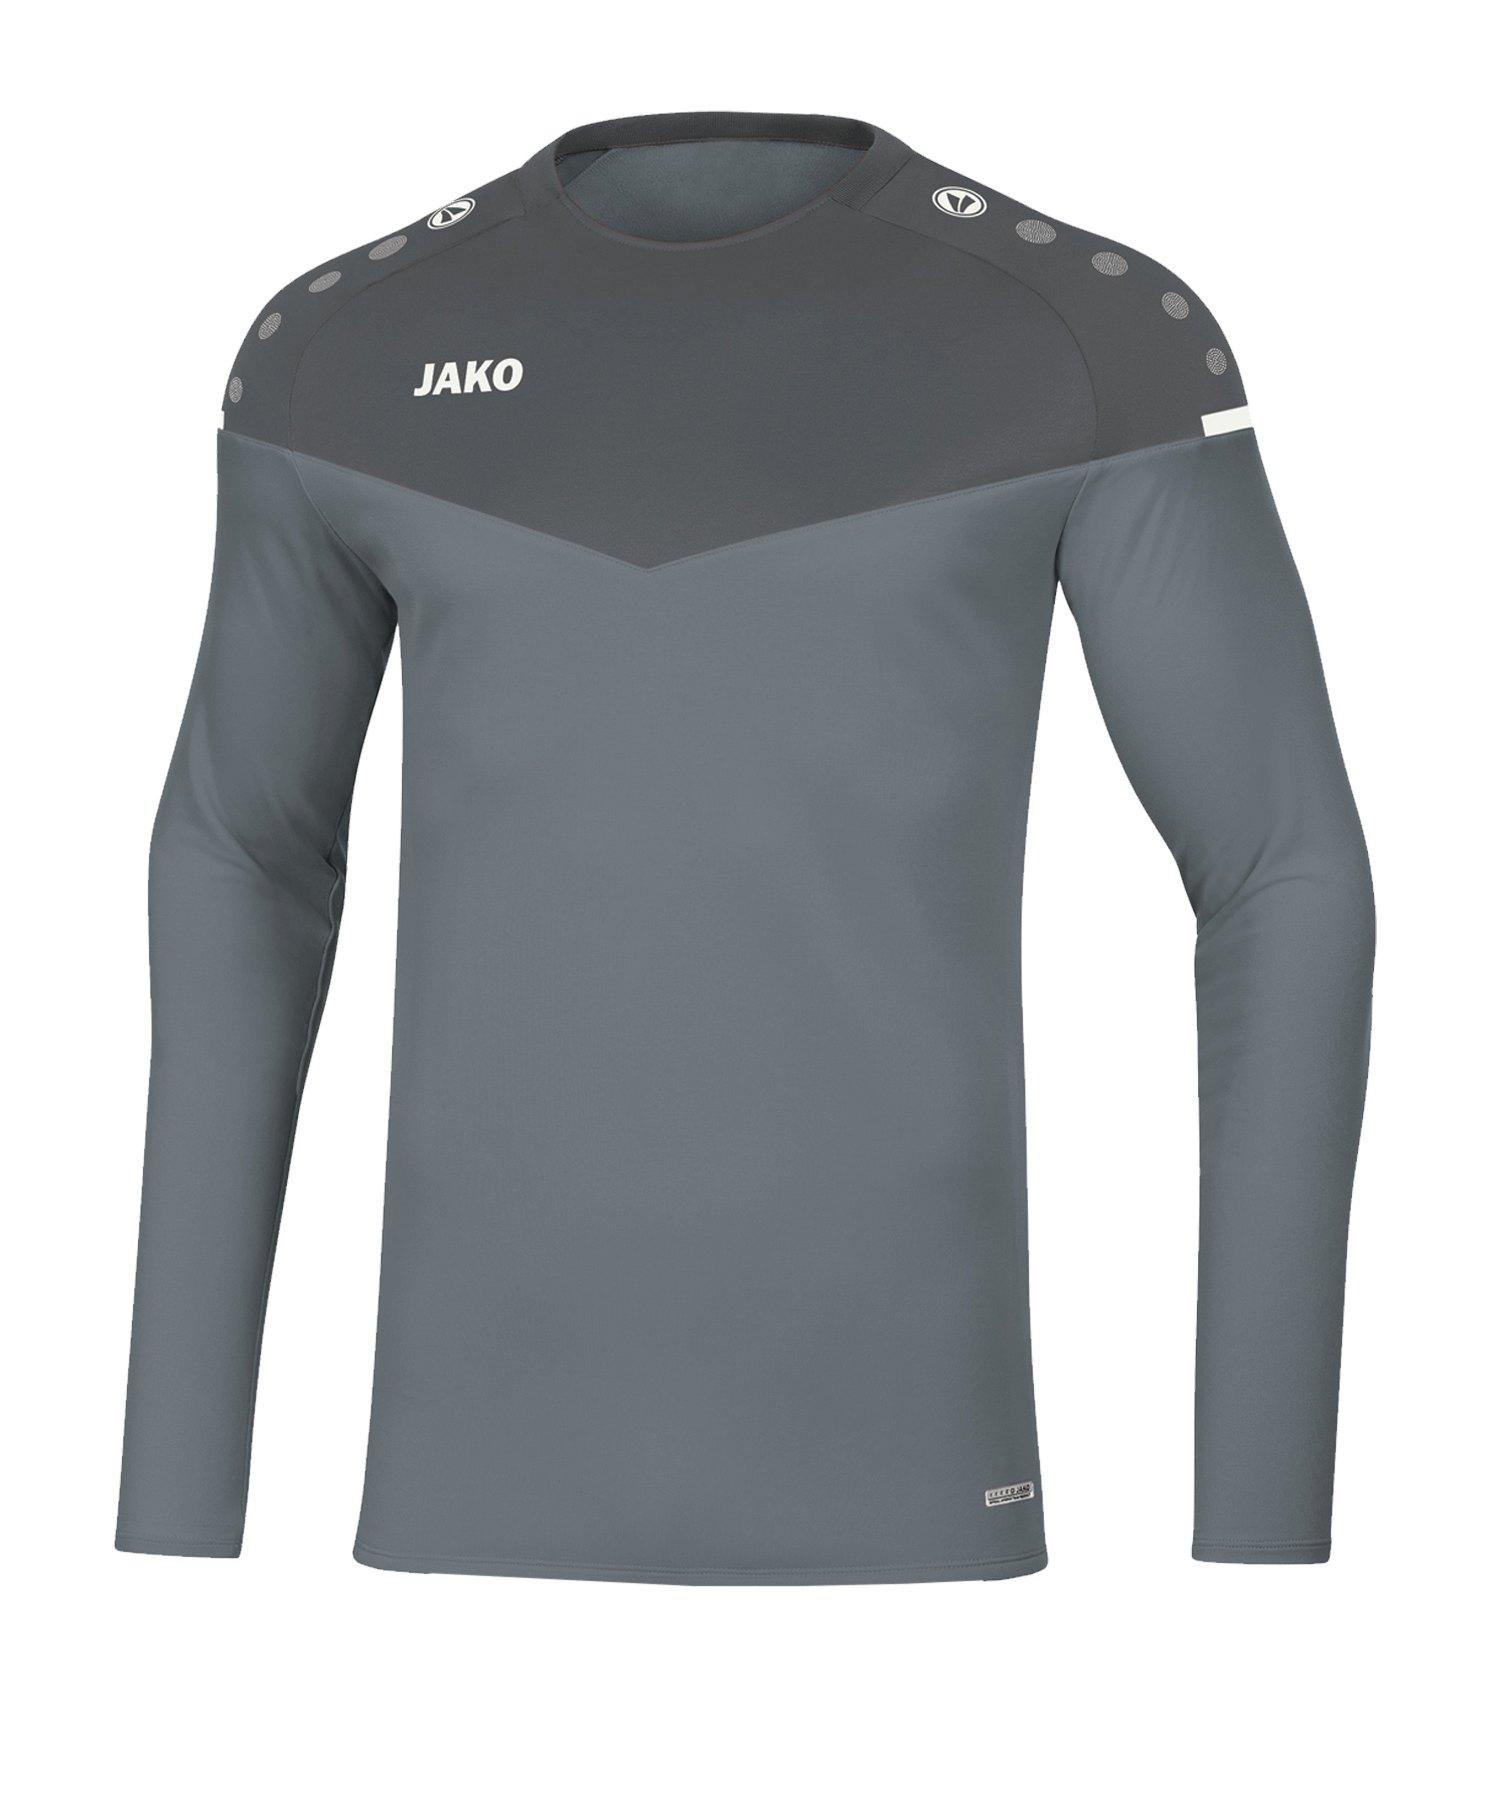 Jako Champ 2.0 Sweatshirt Grau F40 - grau